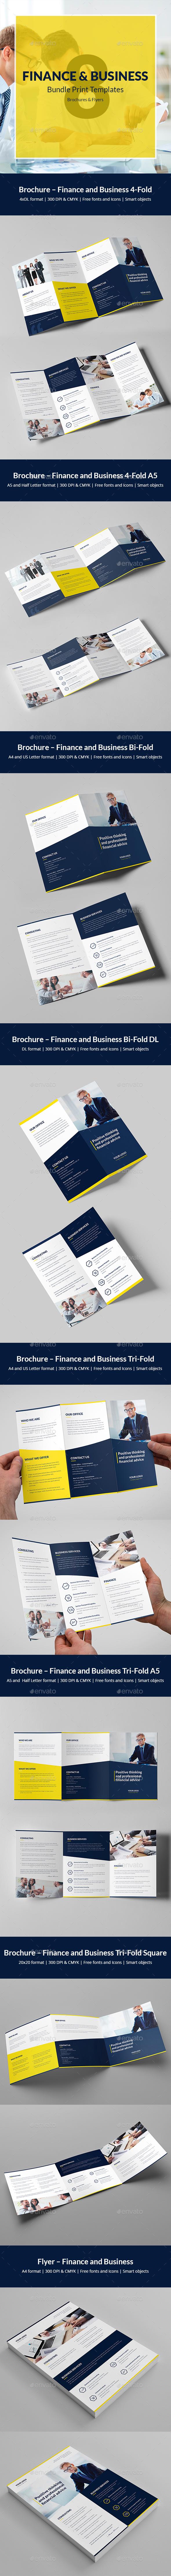 Finance and Business – Brochures Bundle Print Templates 8 in 1 - Corporate Brochures